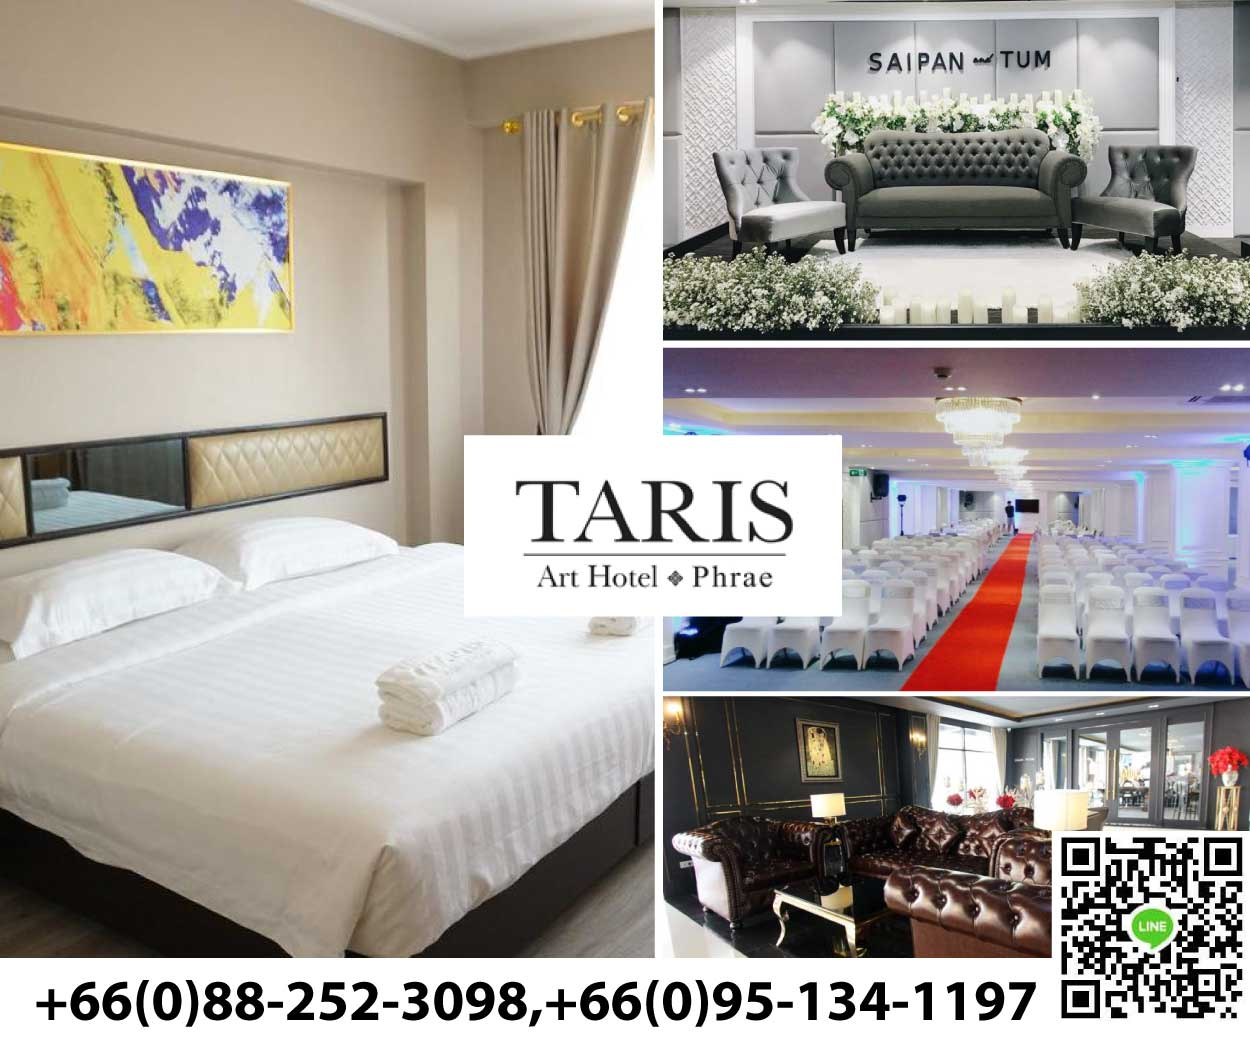 Taris Art Hotel Phrae